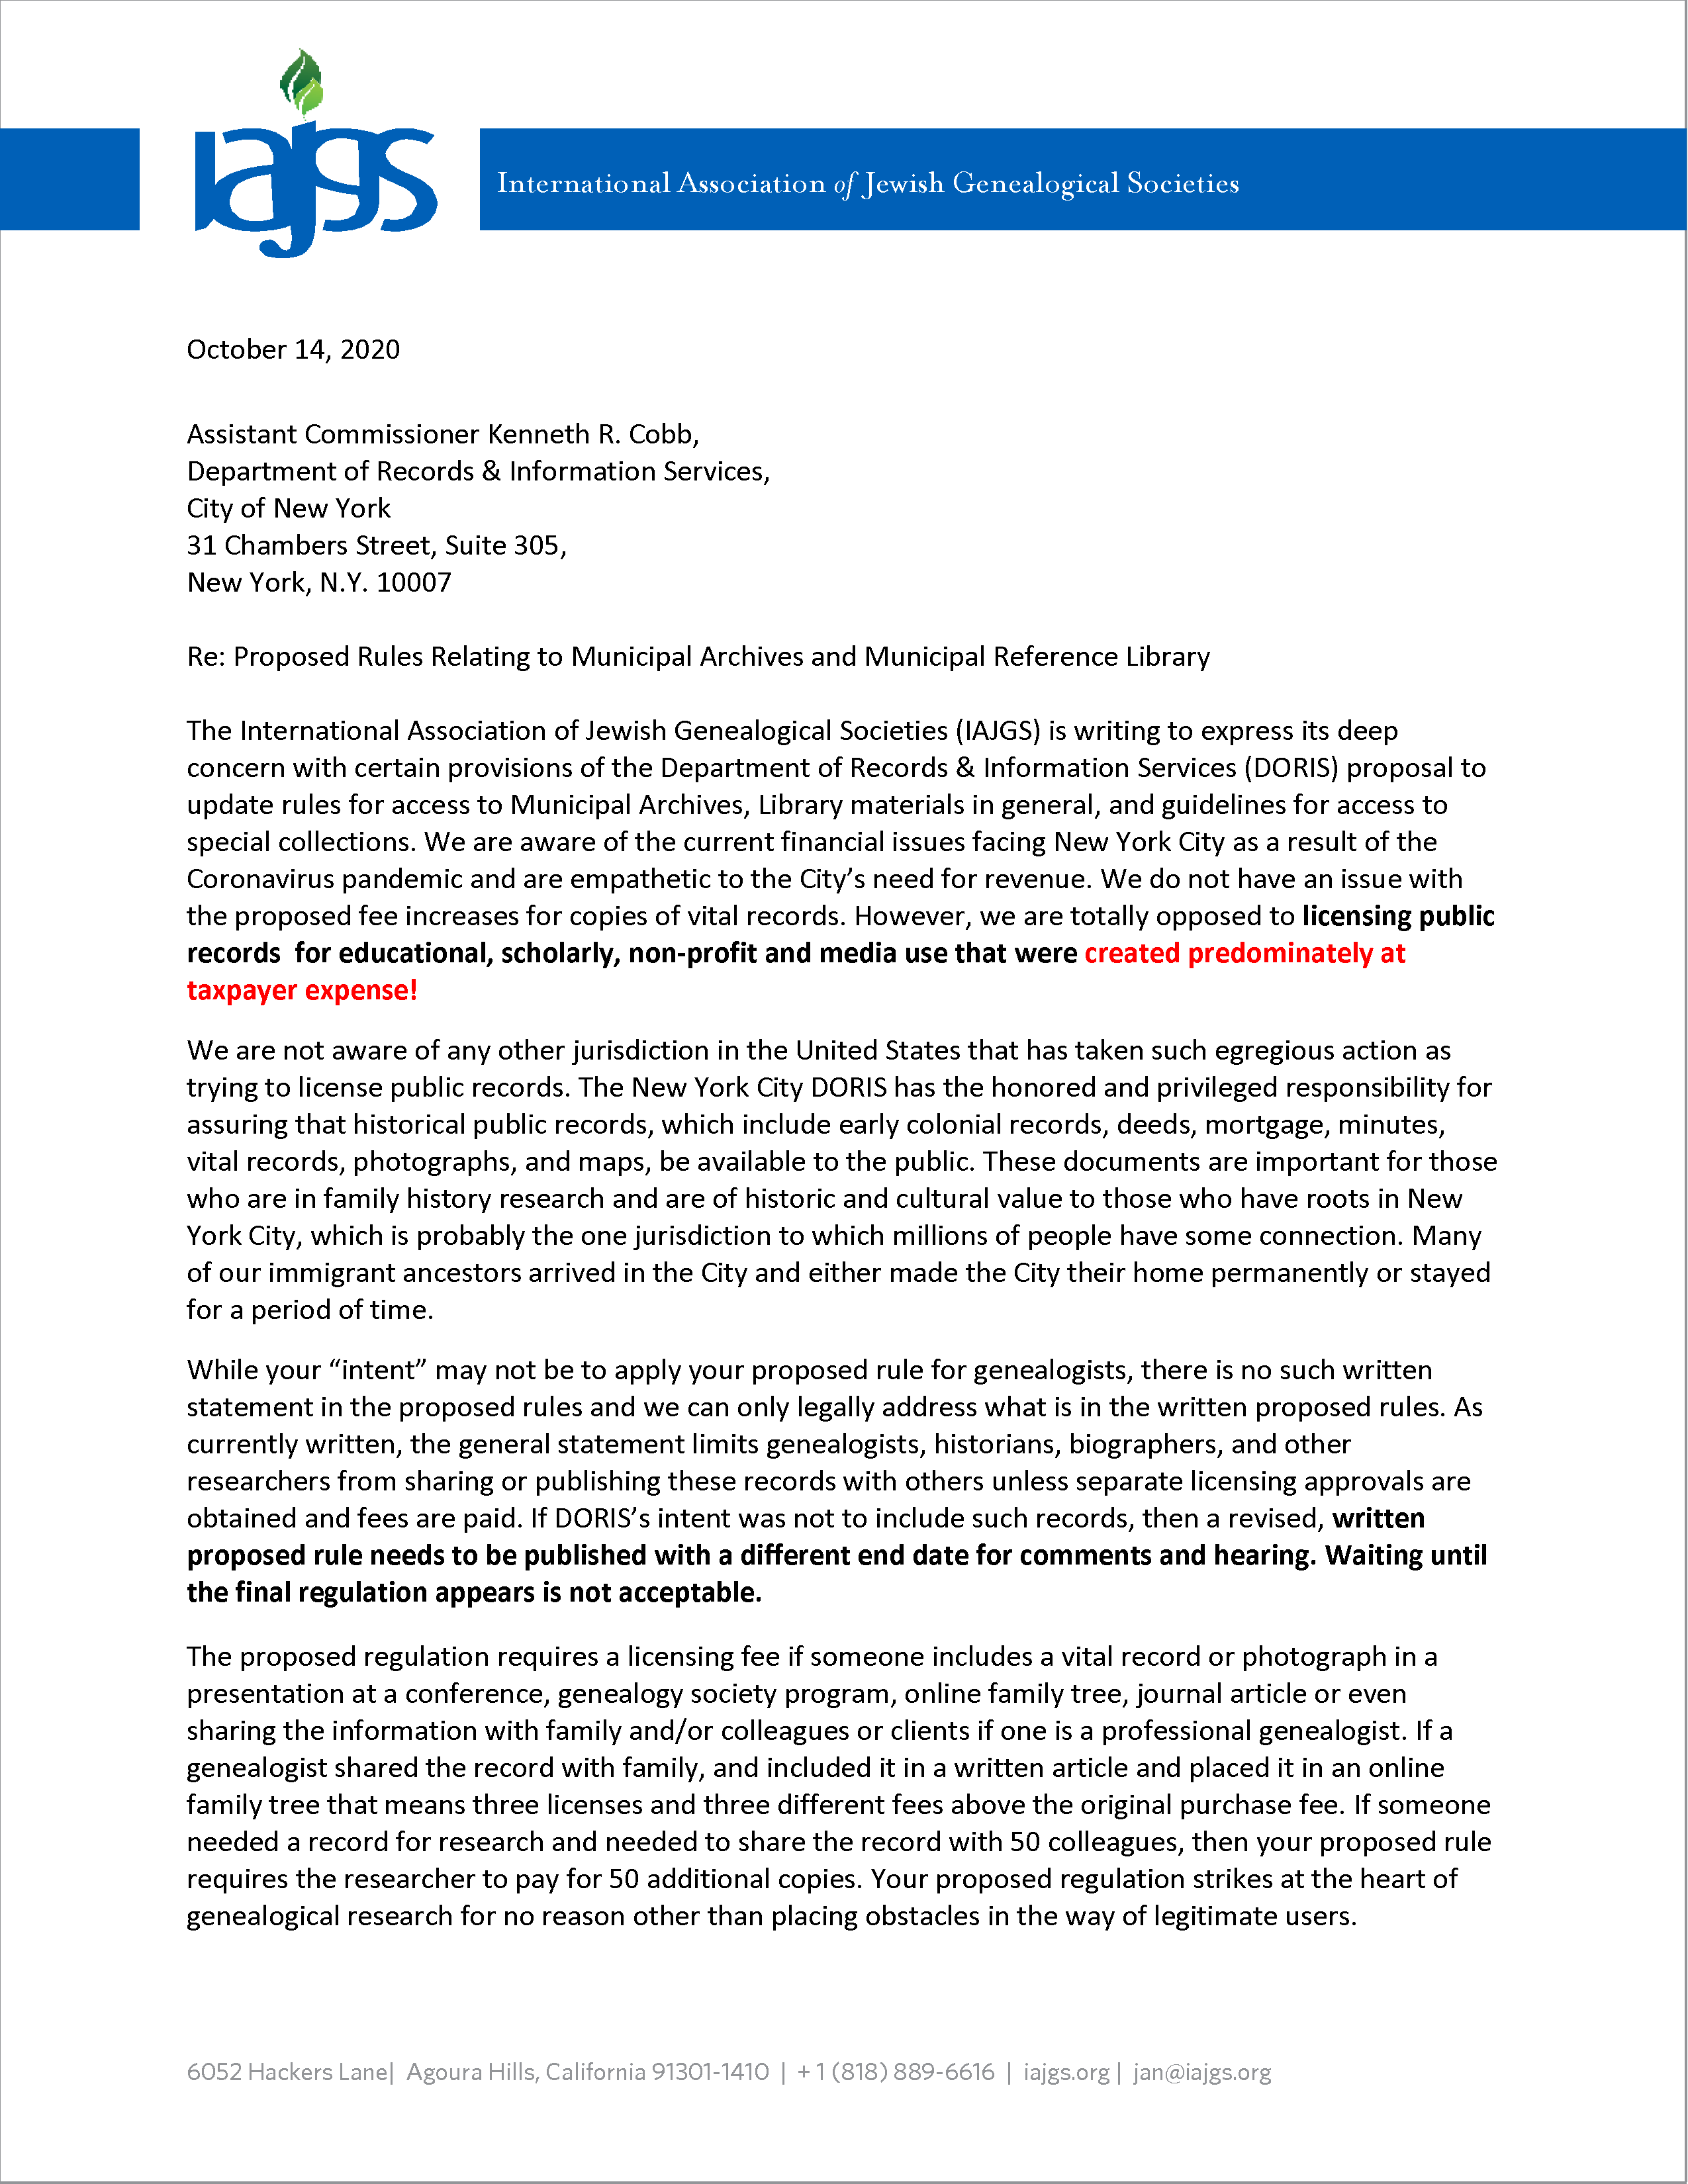 IAJGS' letter (October 14, 2020)